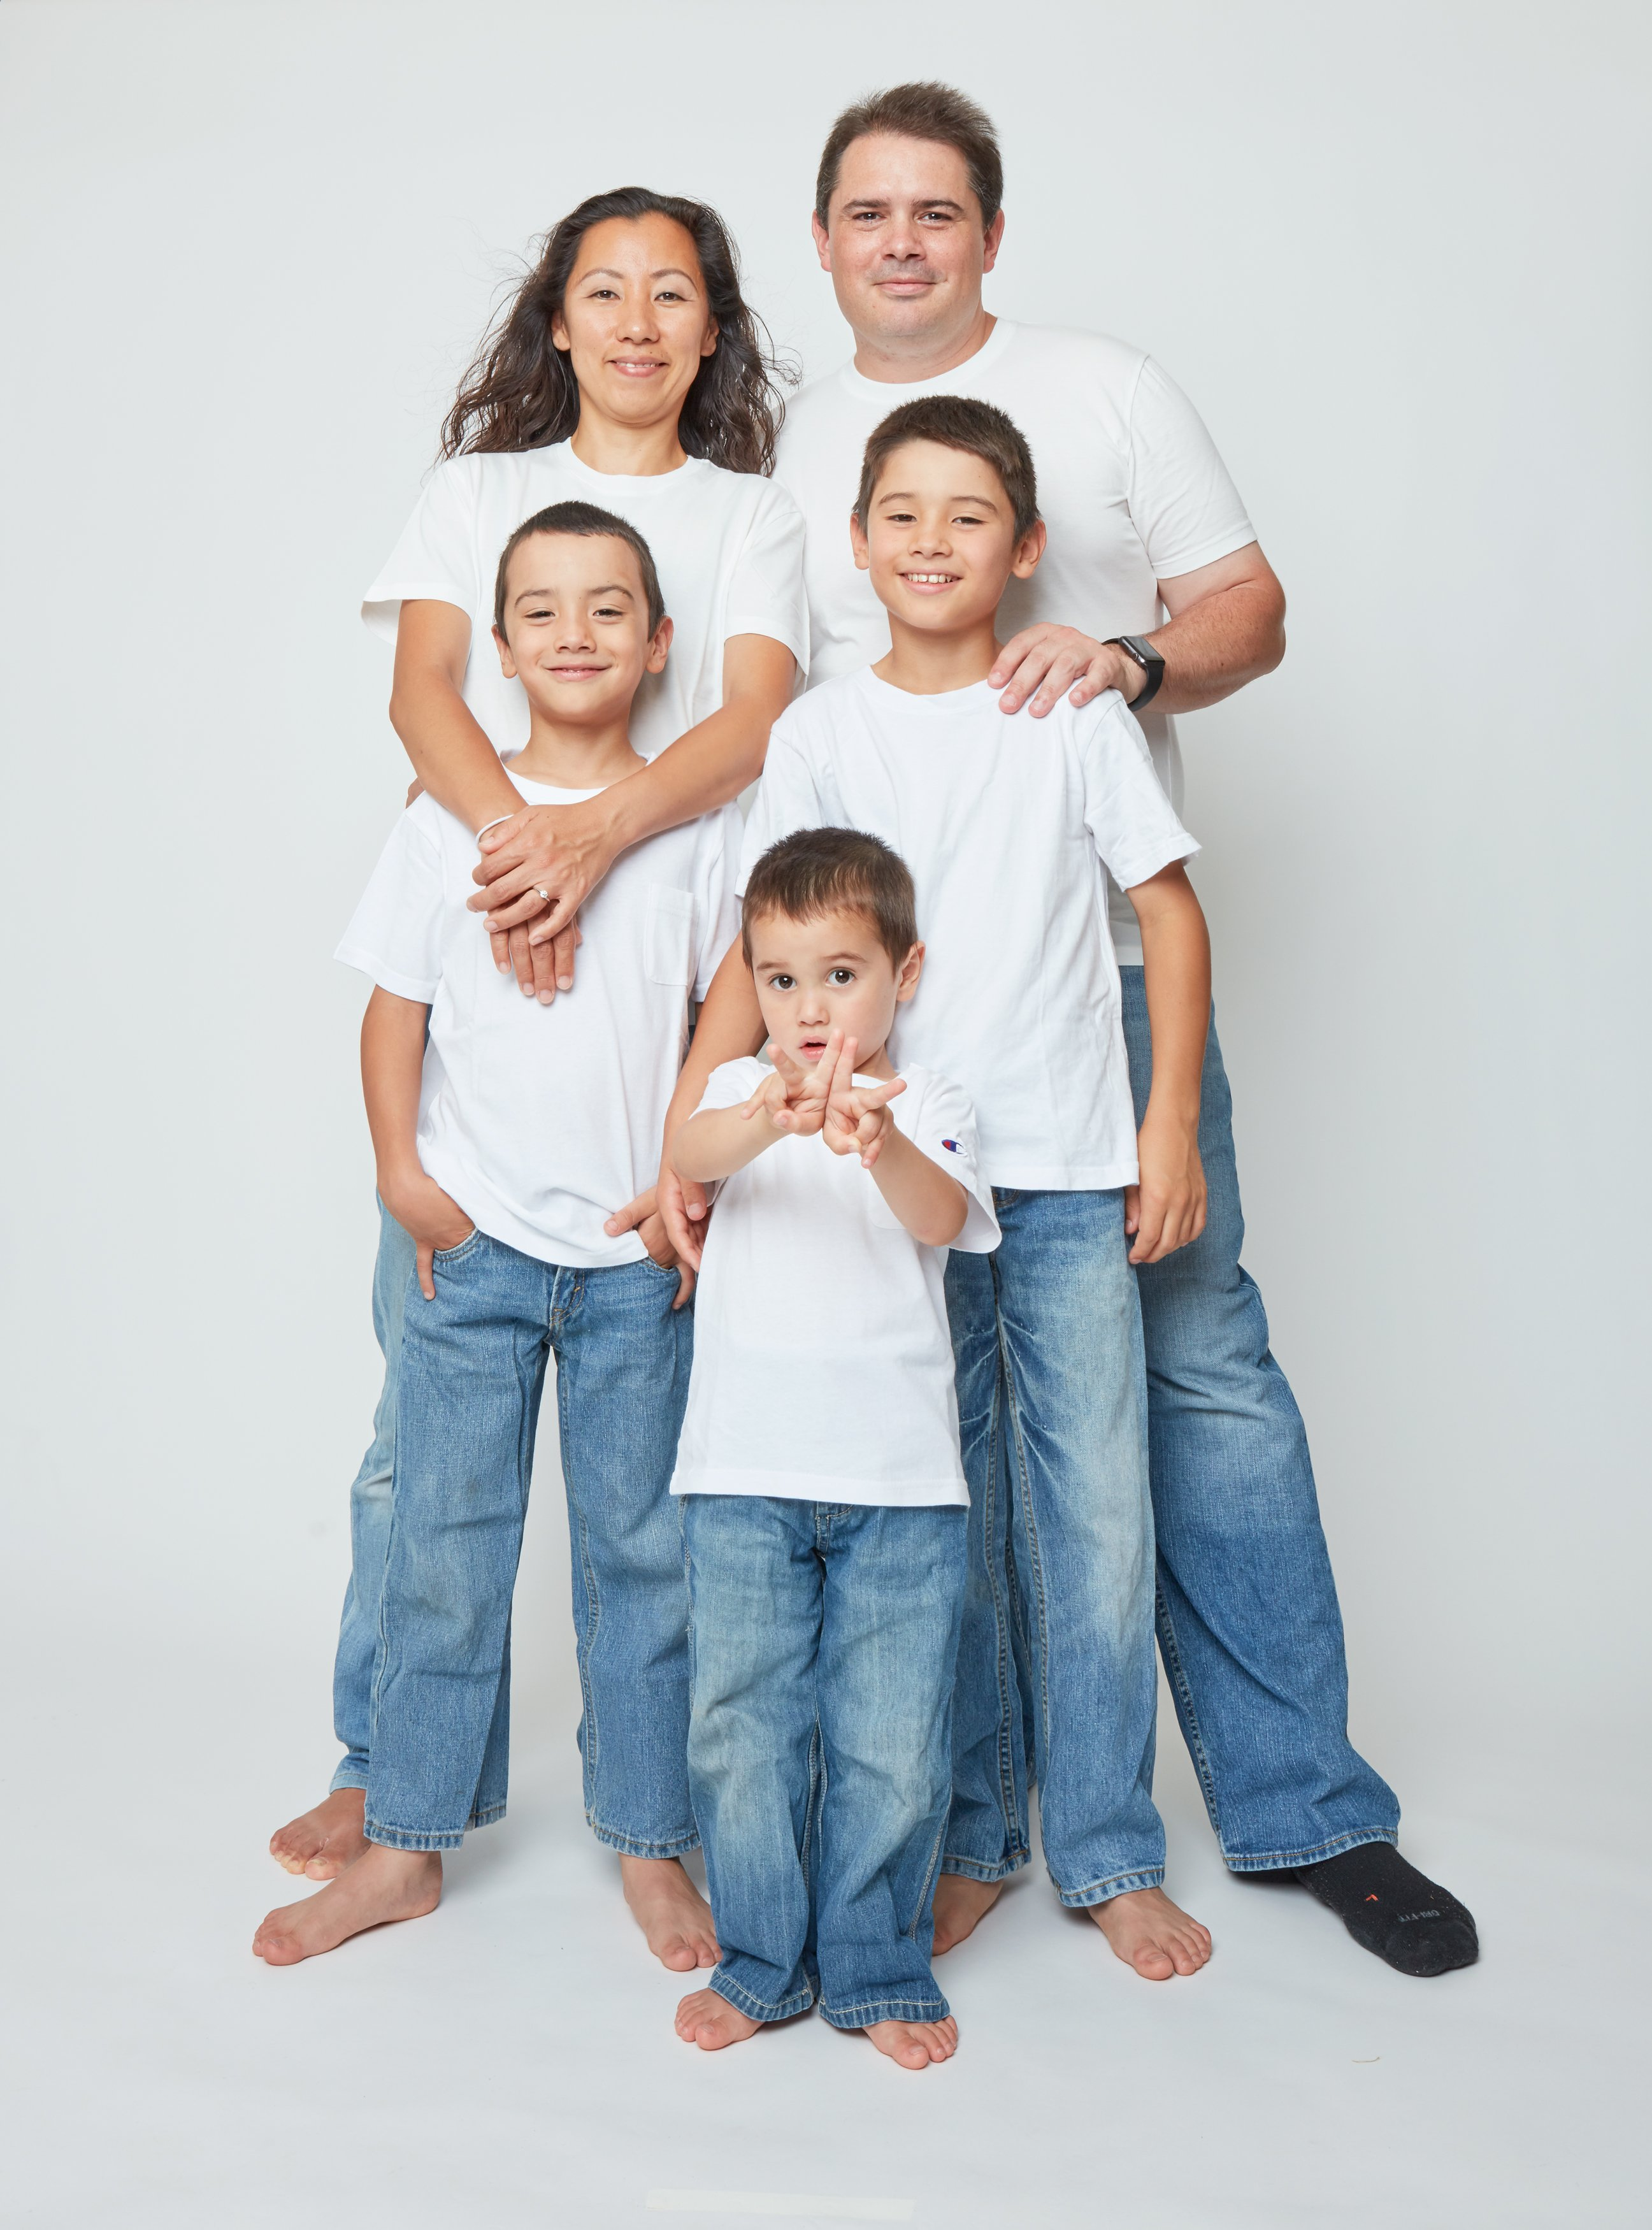 _M5L7740-DePaula-Family-WEB35